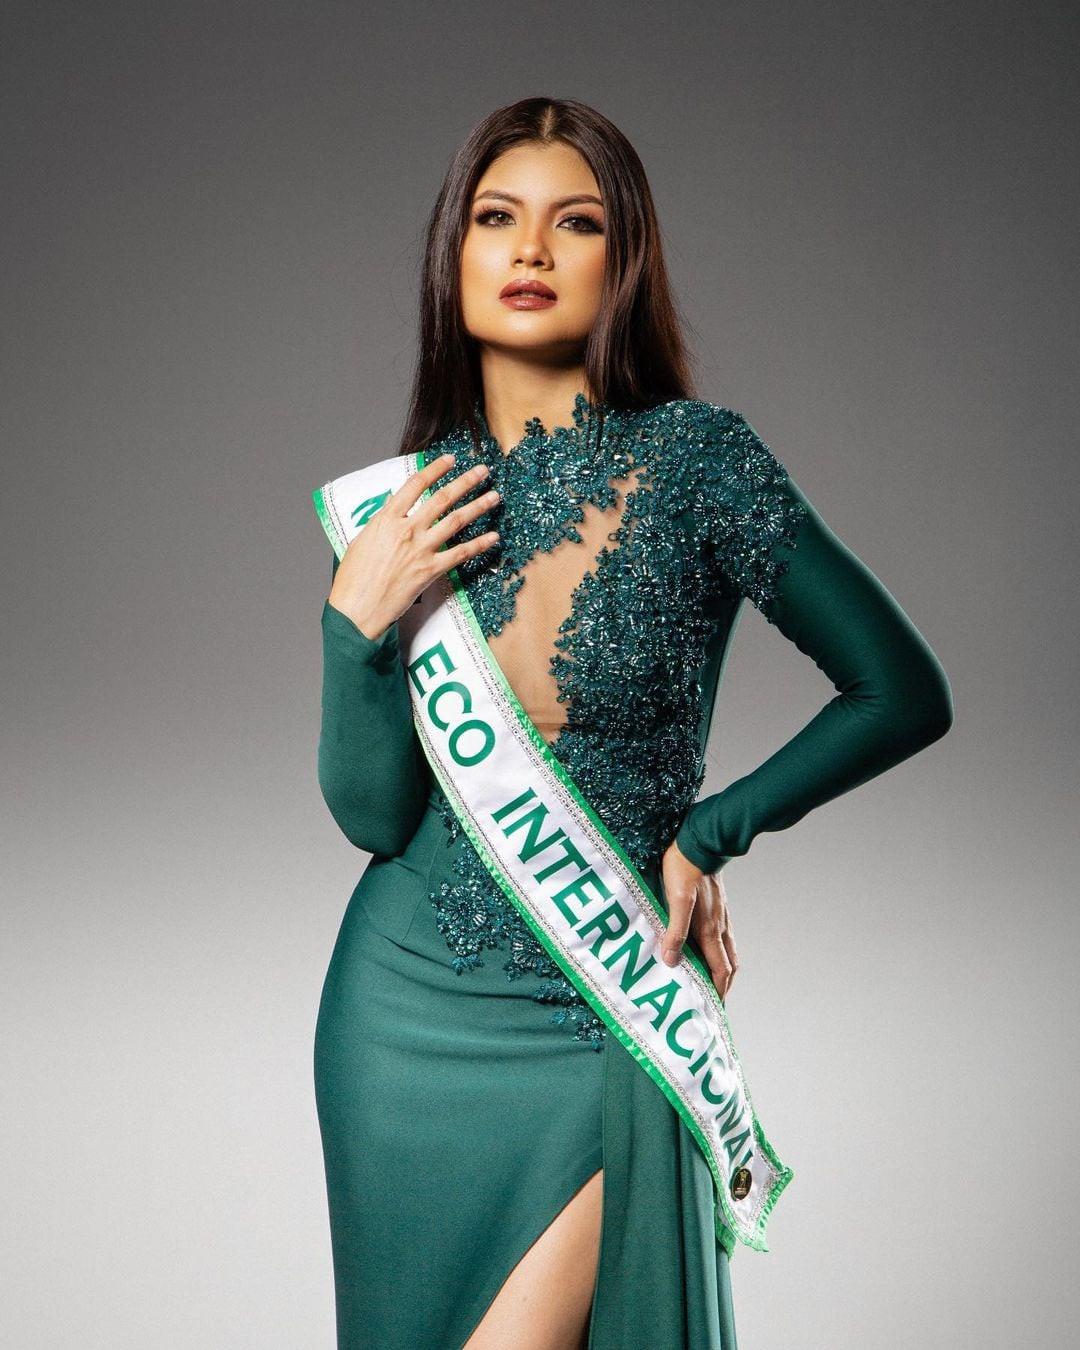 amy tinie aziz, miss eco international 2019 (suplente).  - Página 2 Ql3kjv10